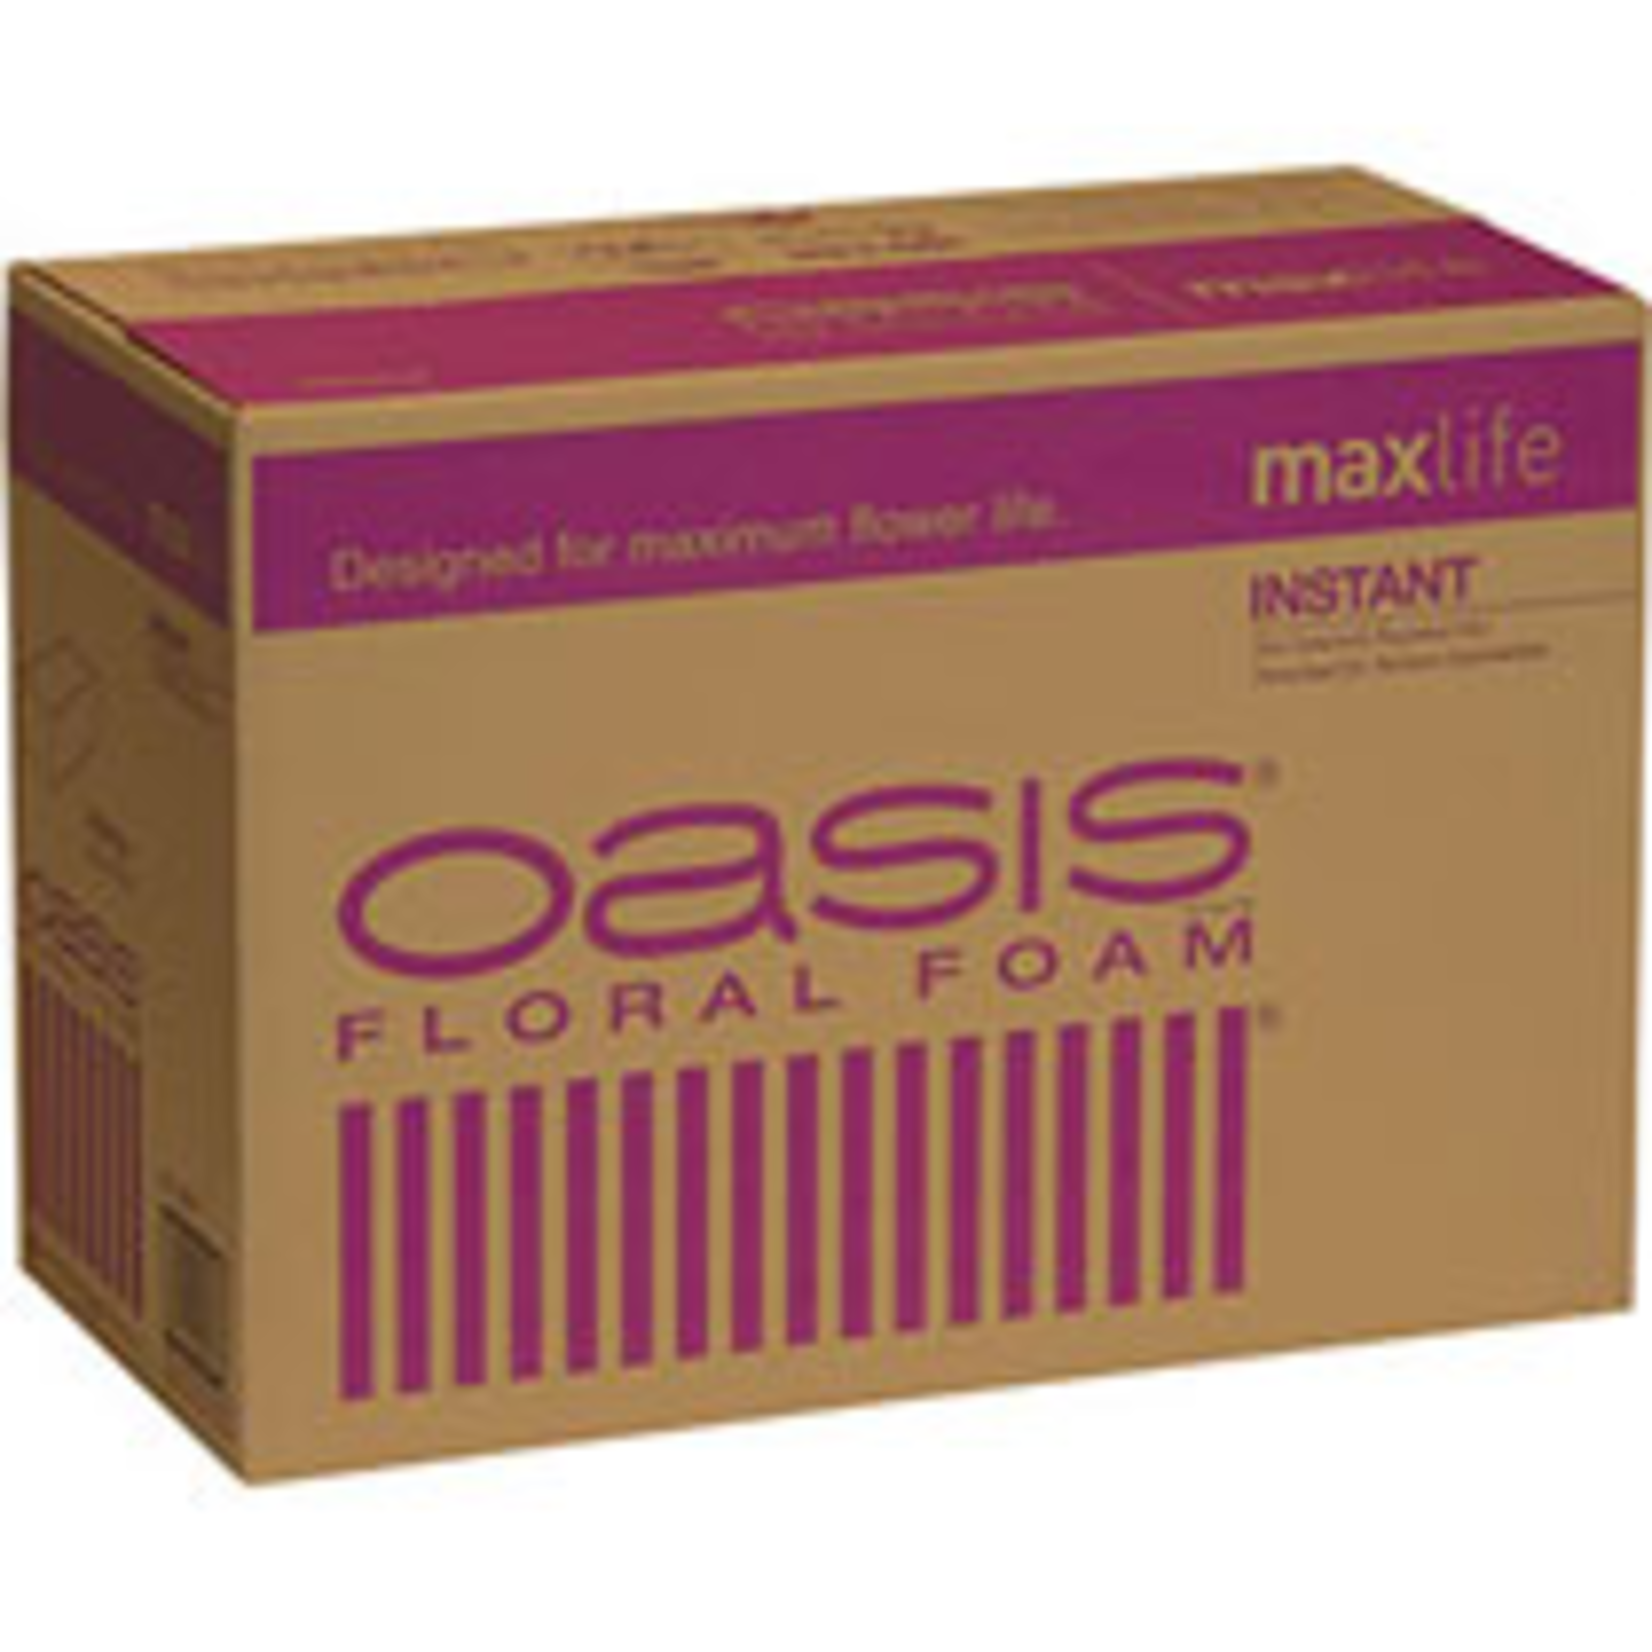 "4"" X 3"" X 9"" OASIS MAX LIFE Instant Floral Foam"